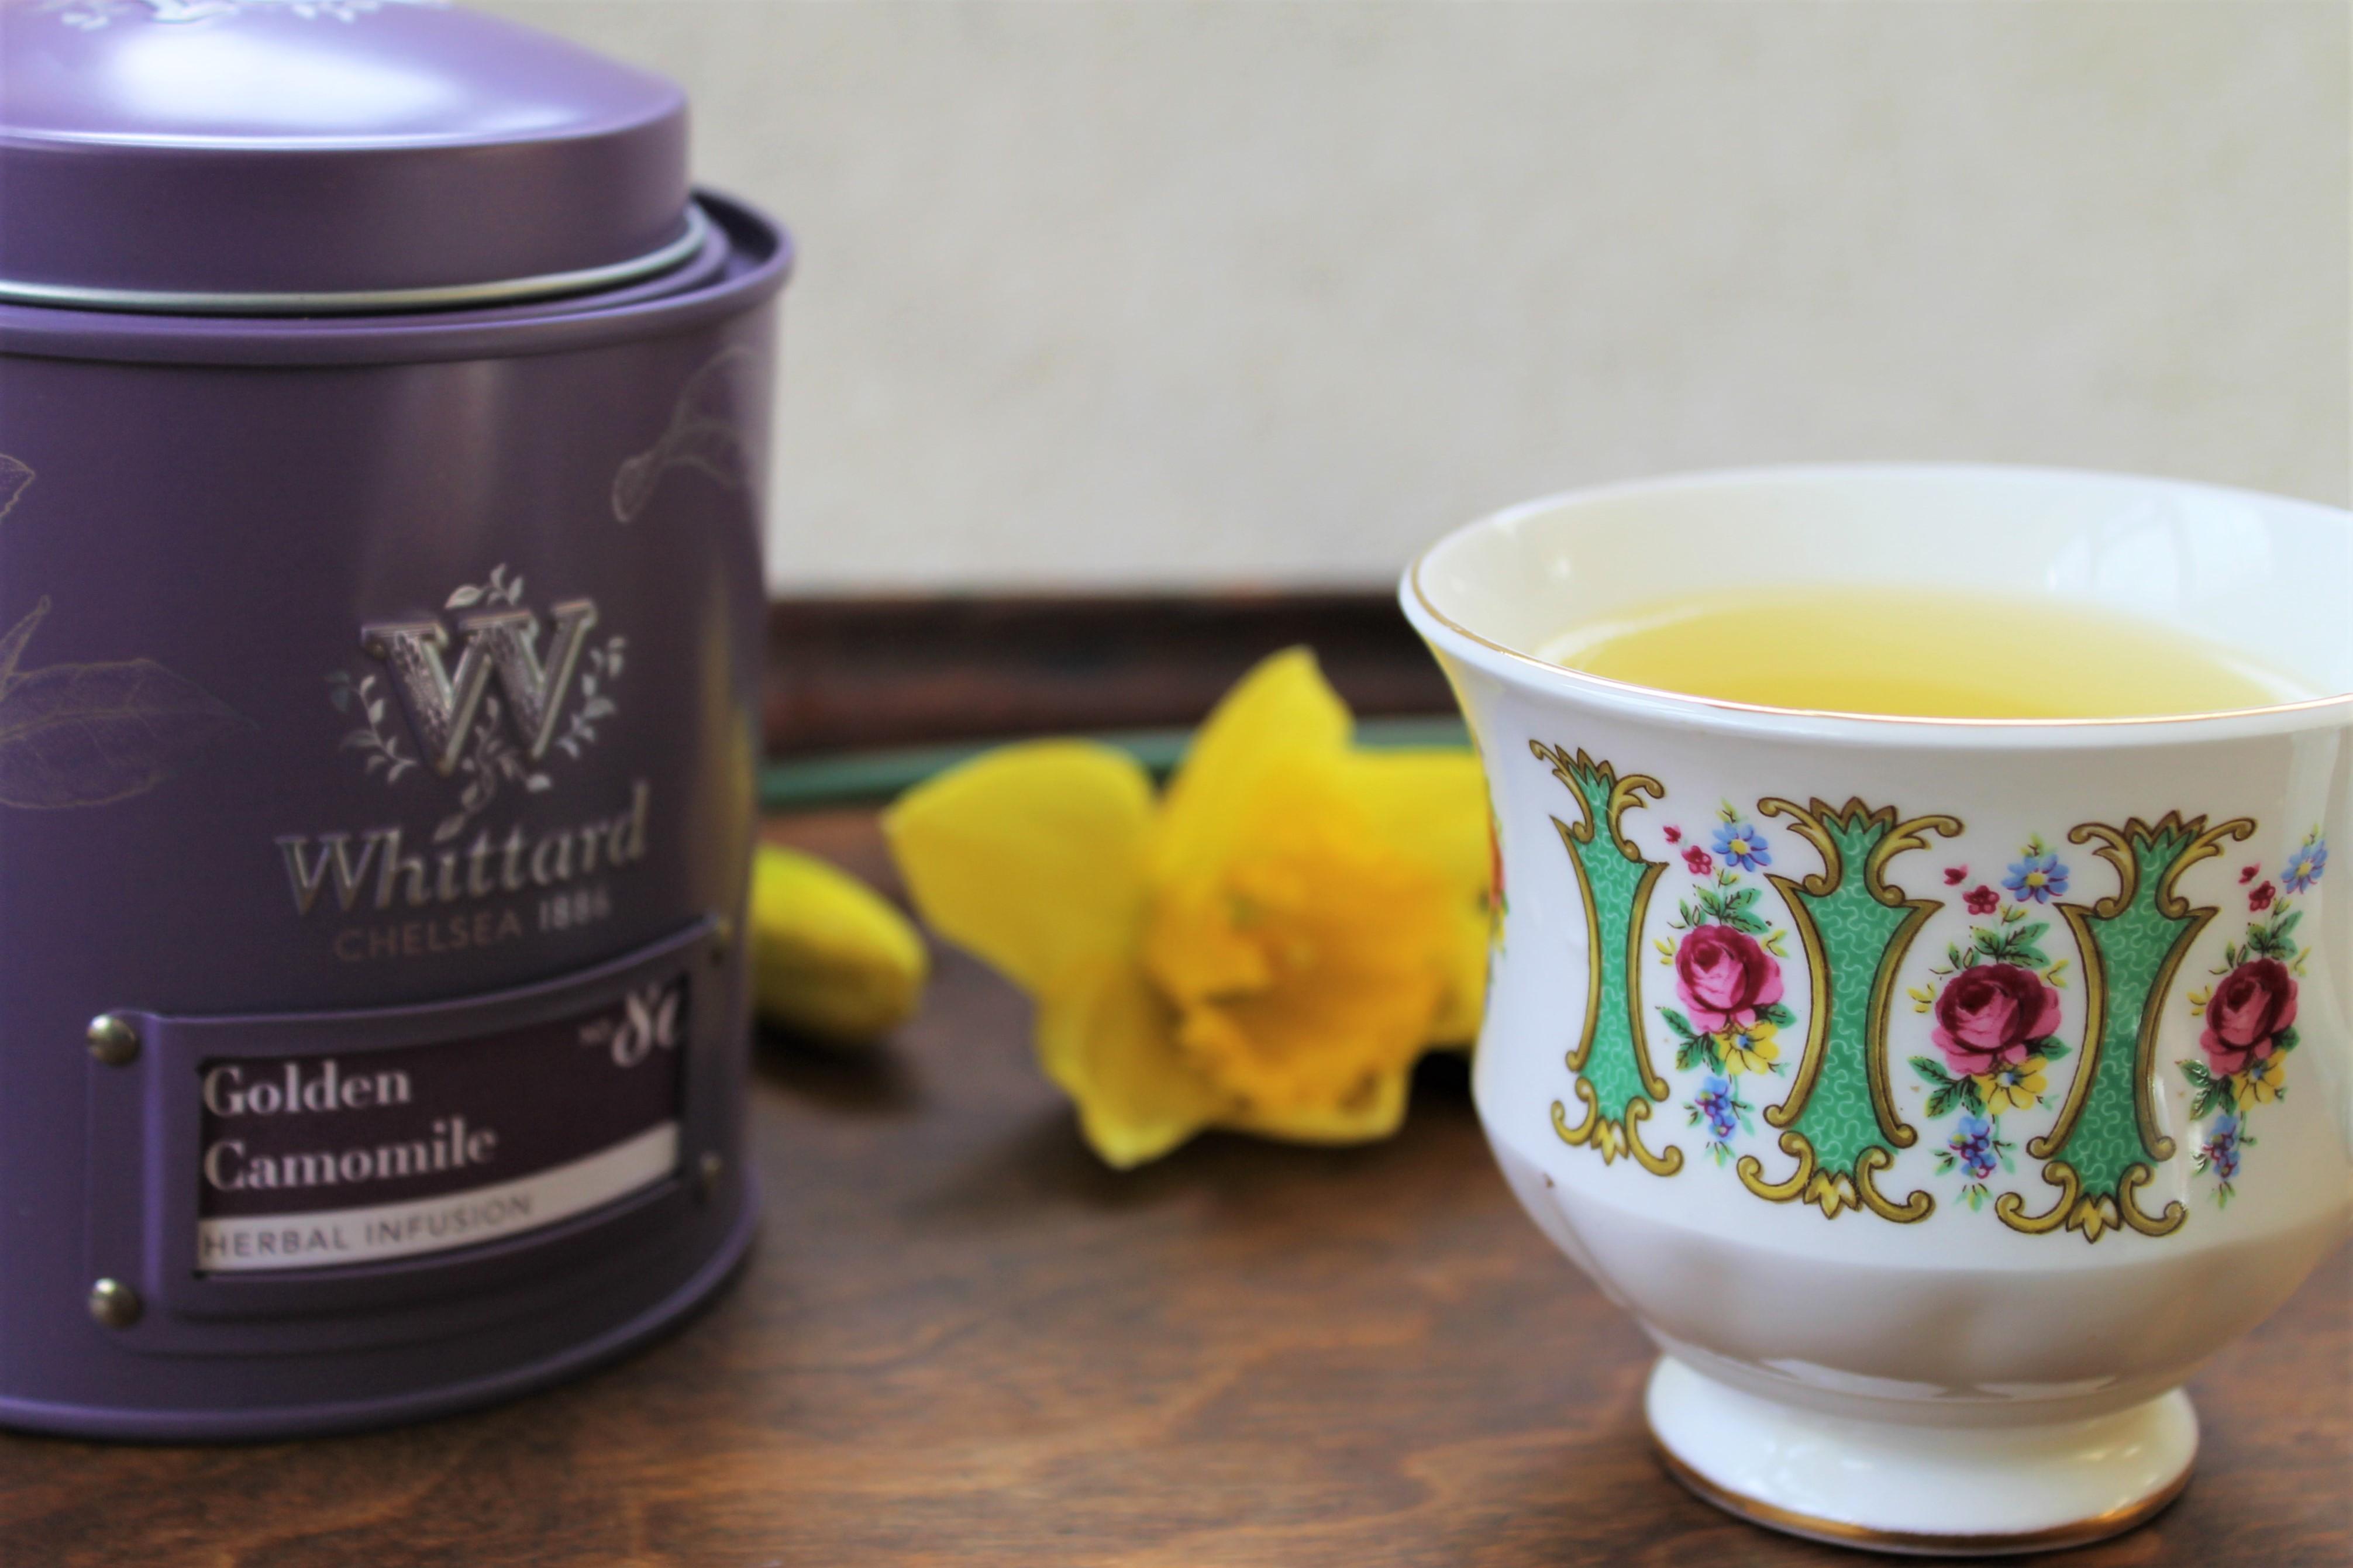 Whittard Chamomile Tea Review